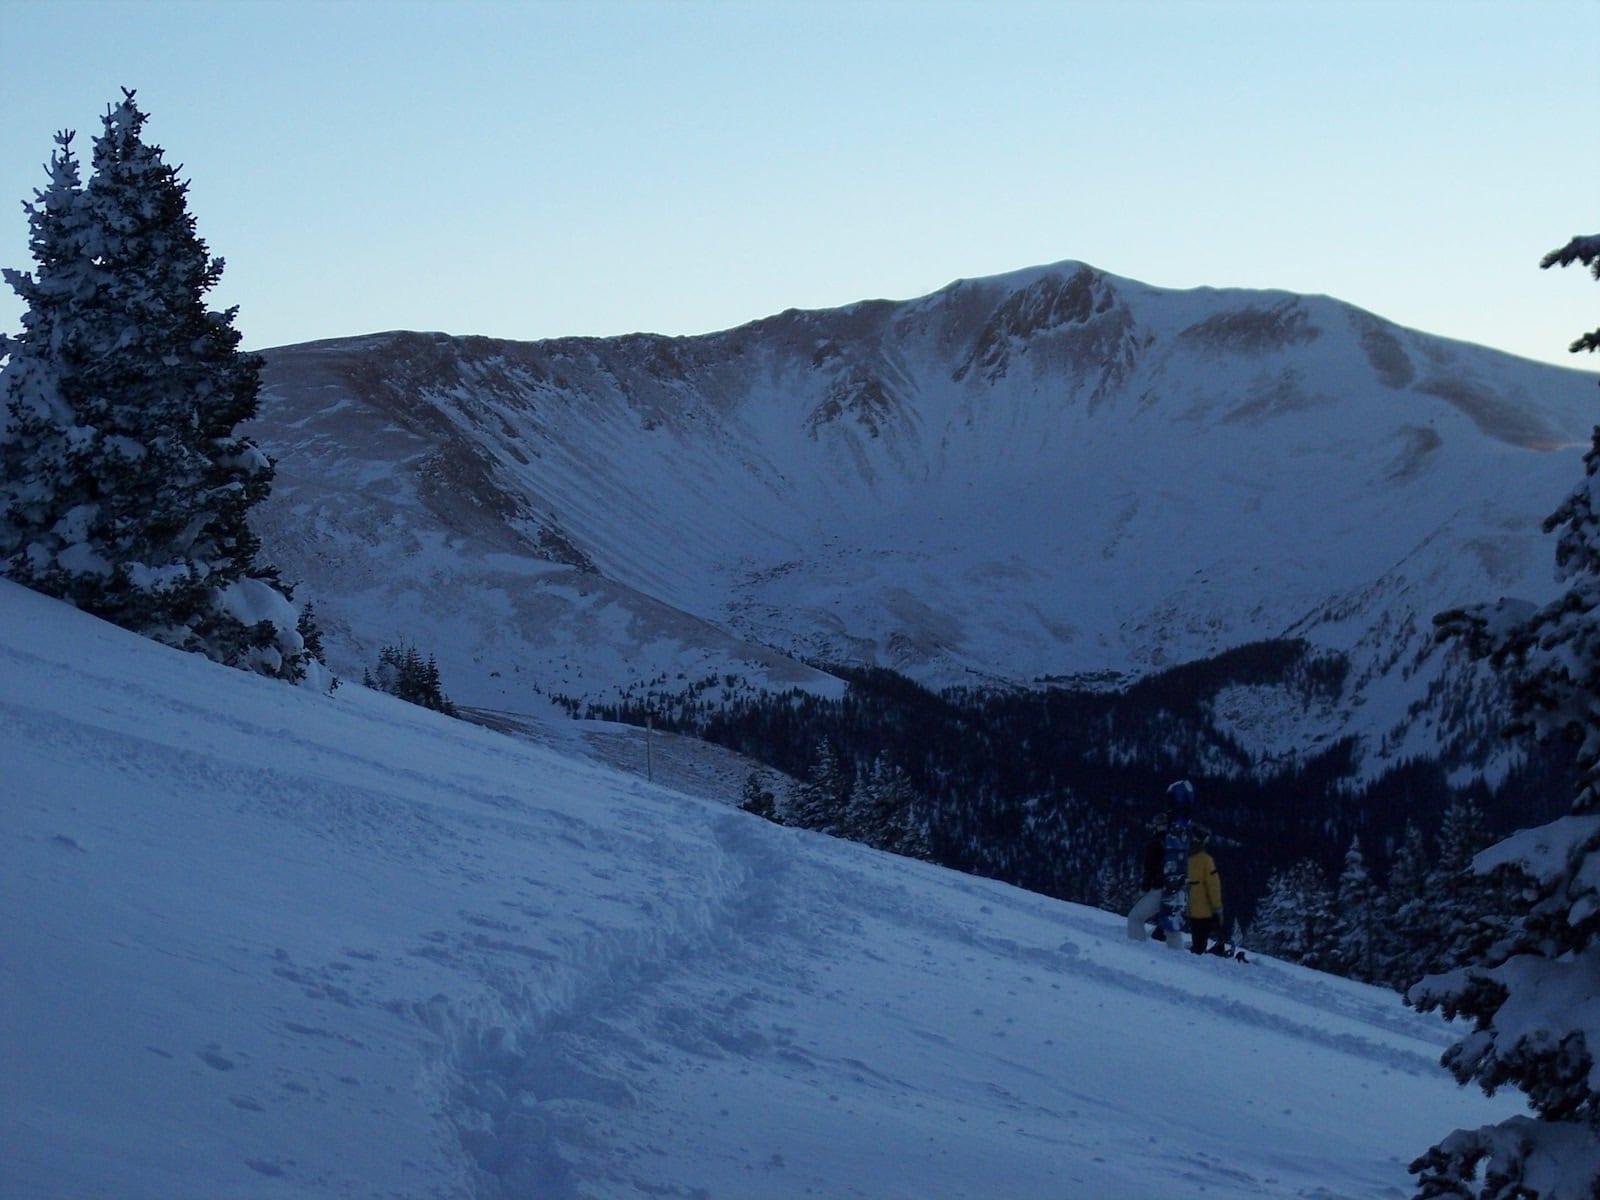 Ski at Berthoud Pass, CO